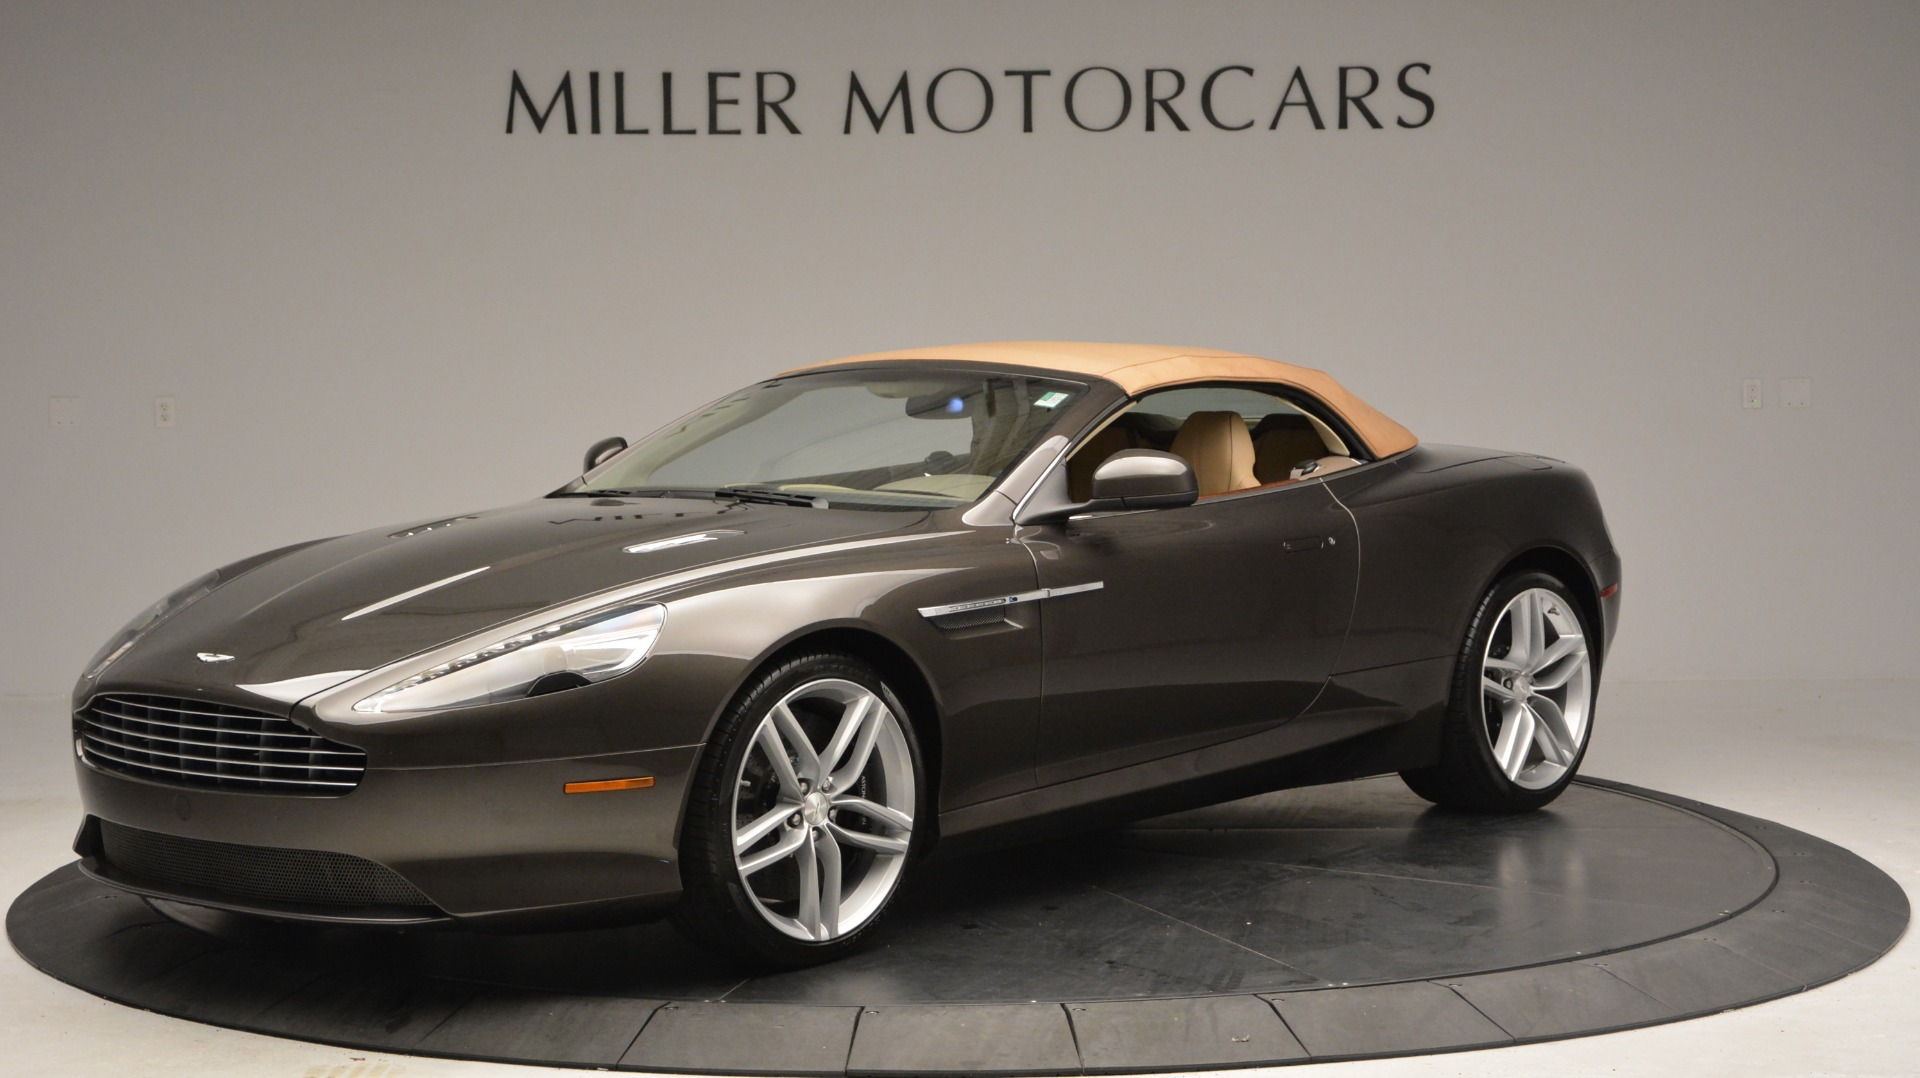 Used 2012 Aston Martin Virage Convertible For Sale In Greenwich, CT. Alfa Romeo of Greenwich, 7613 3351_p15